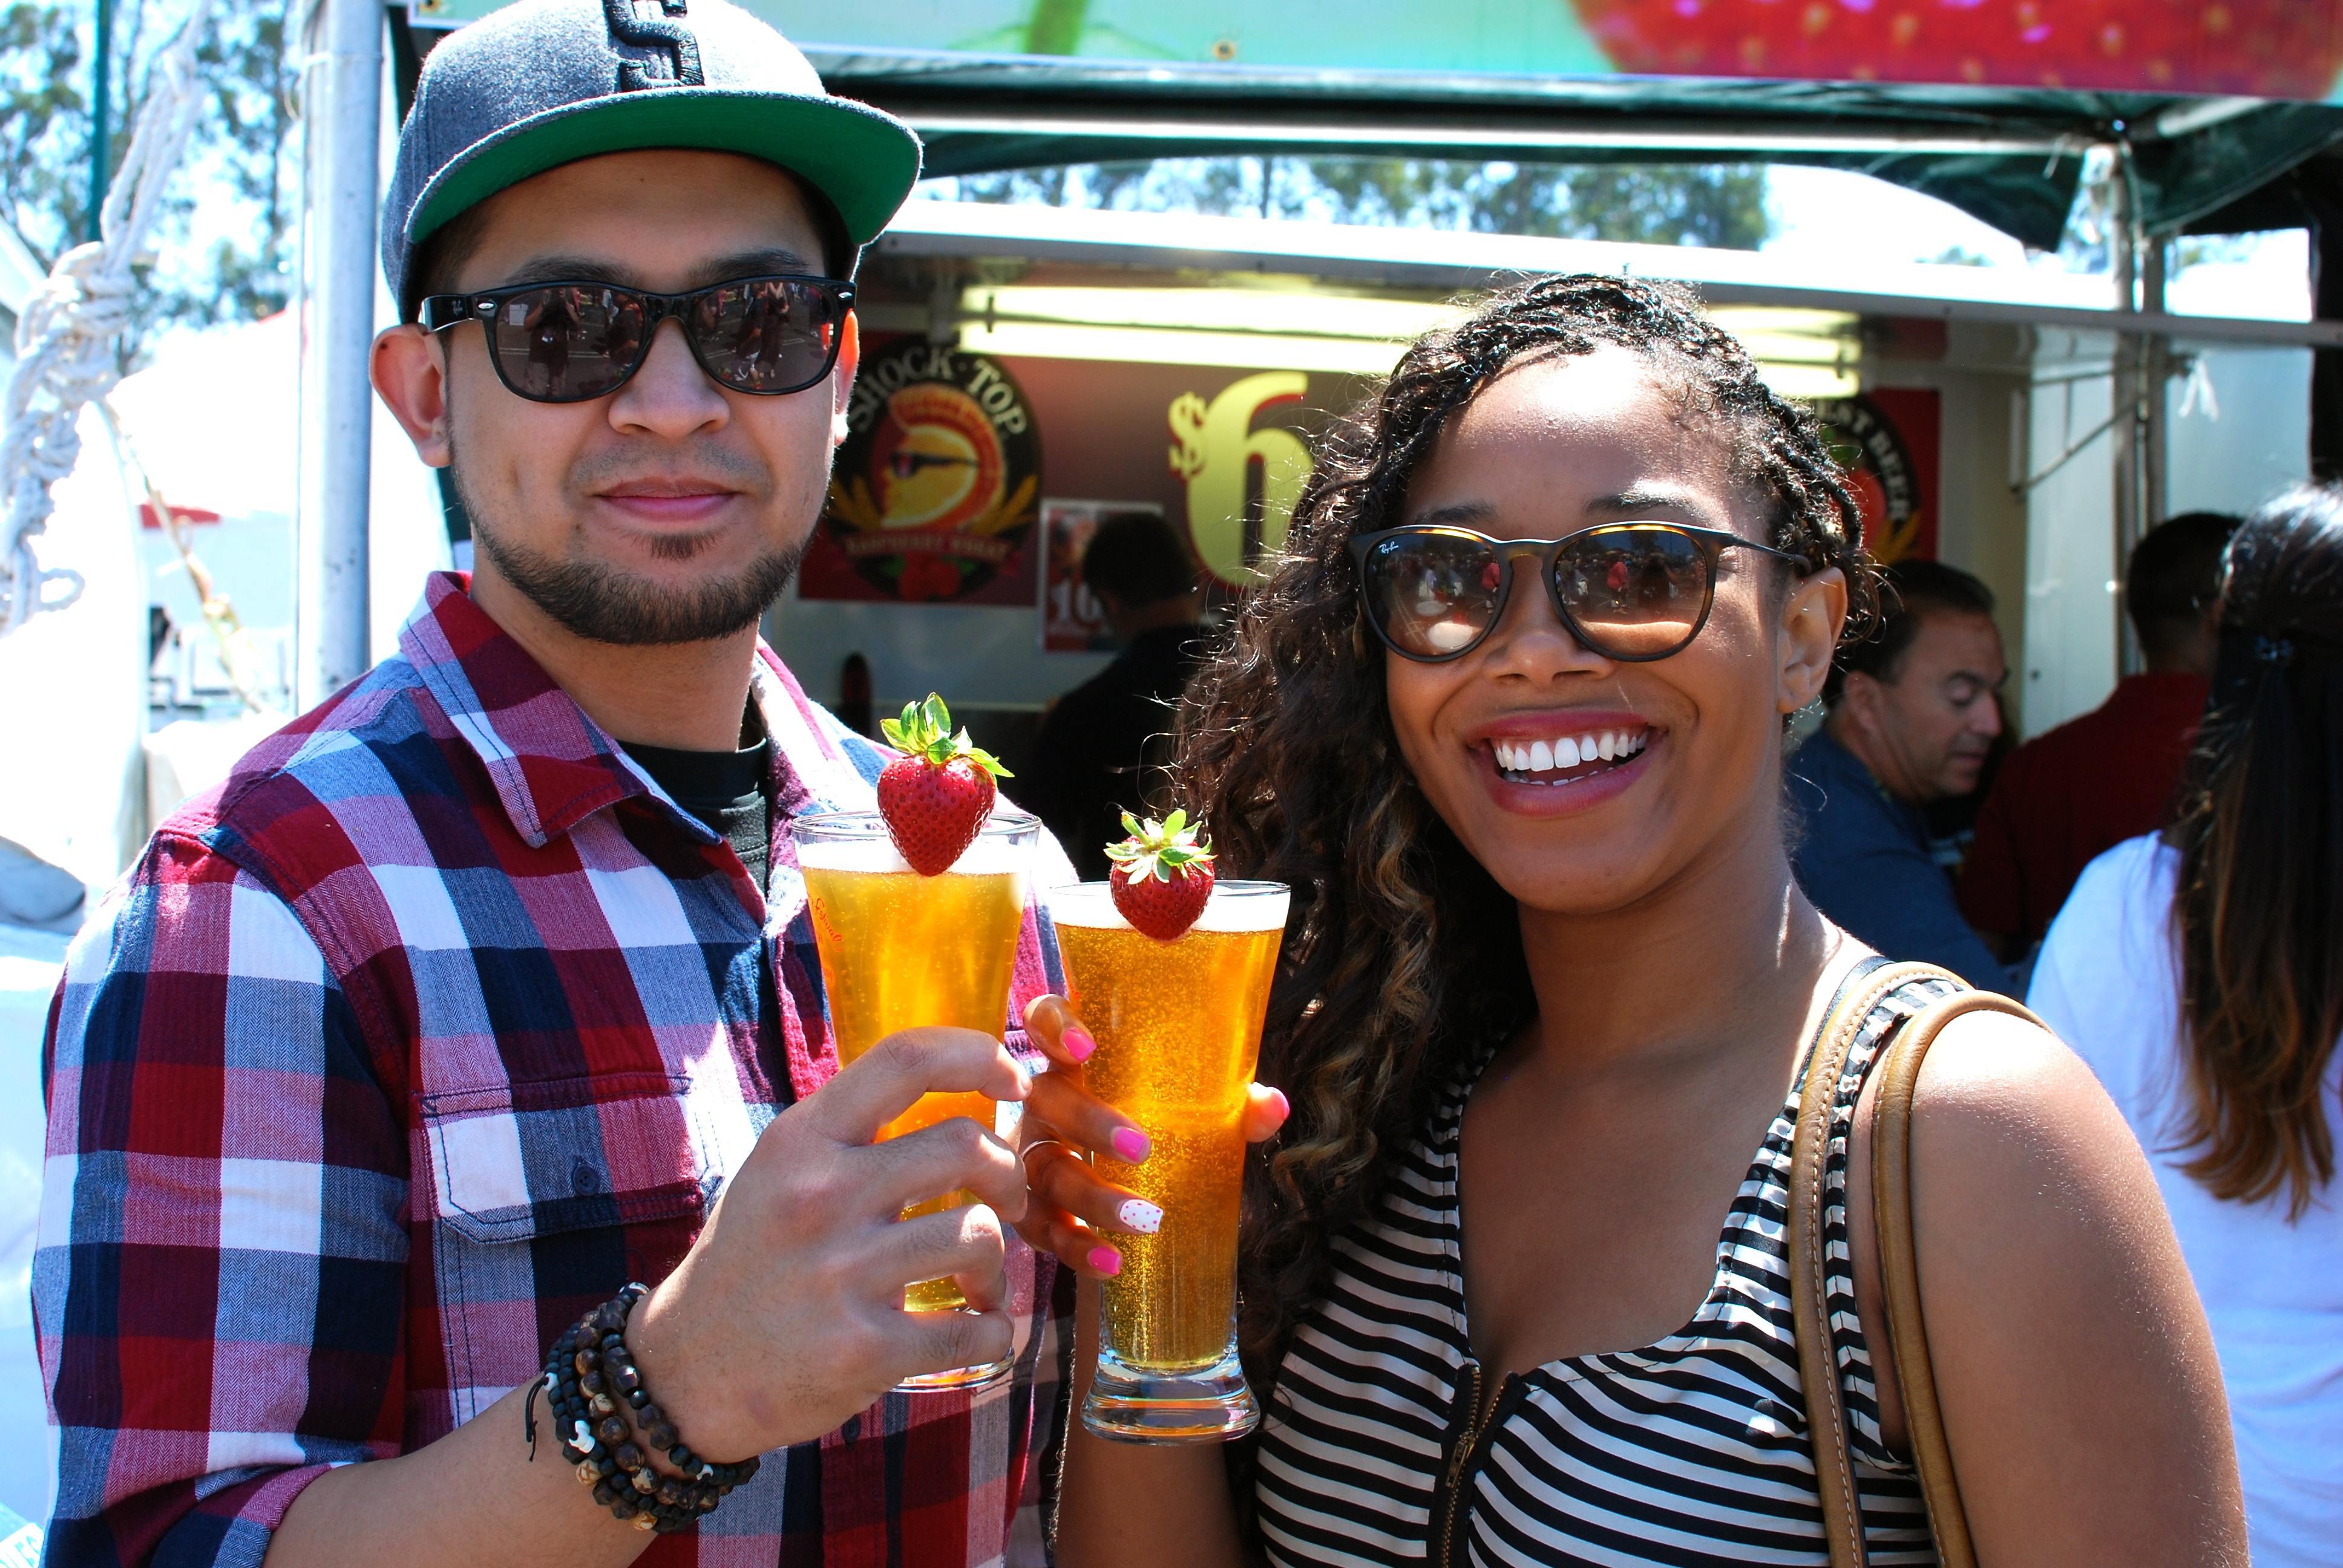 Oxnard Strawberry Festival